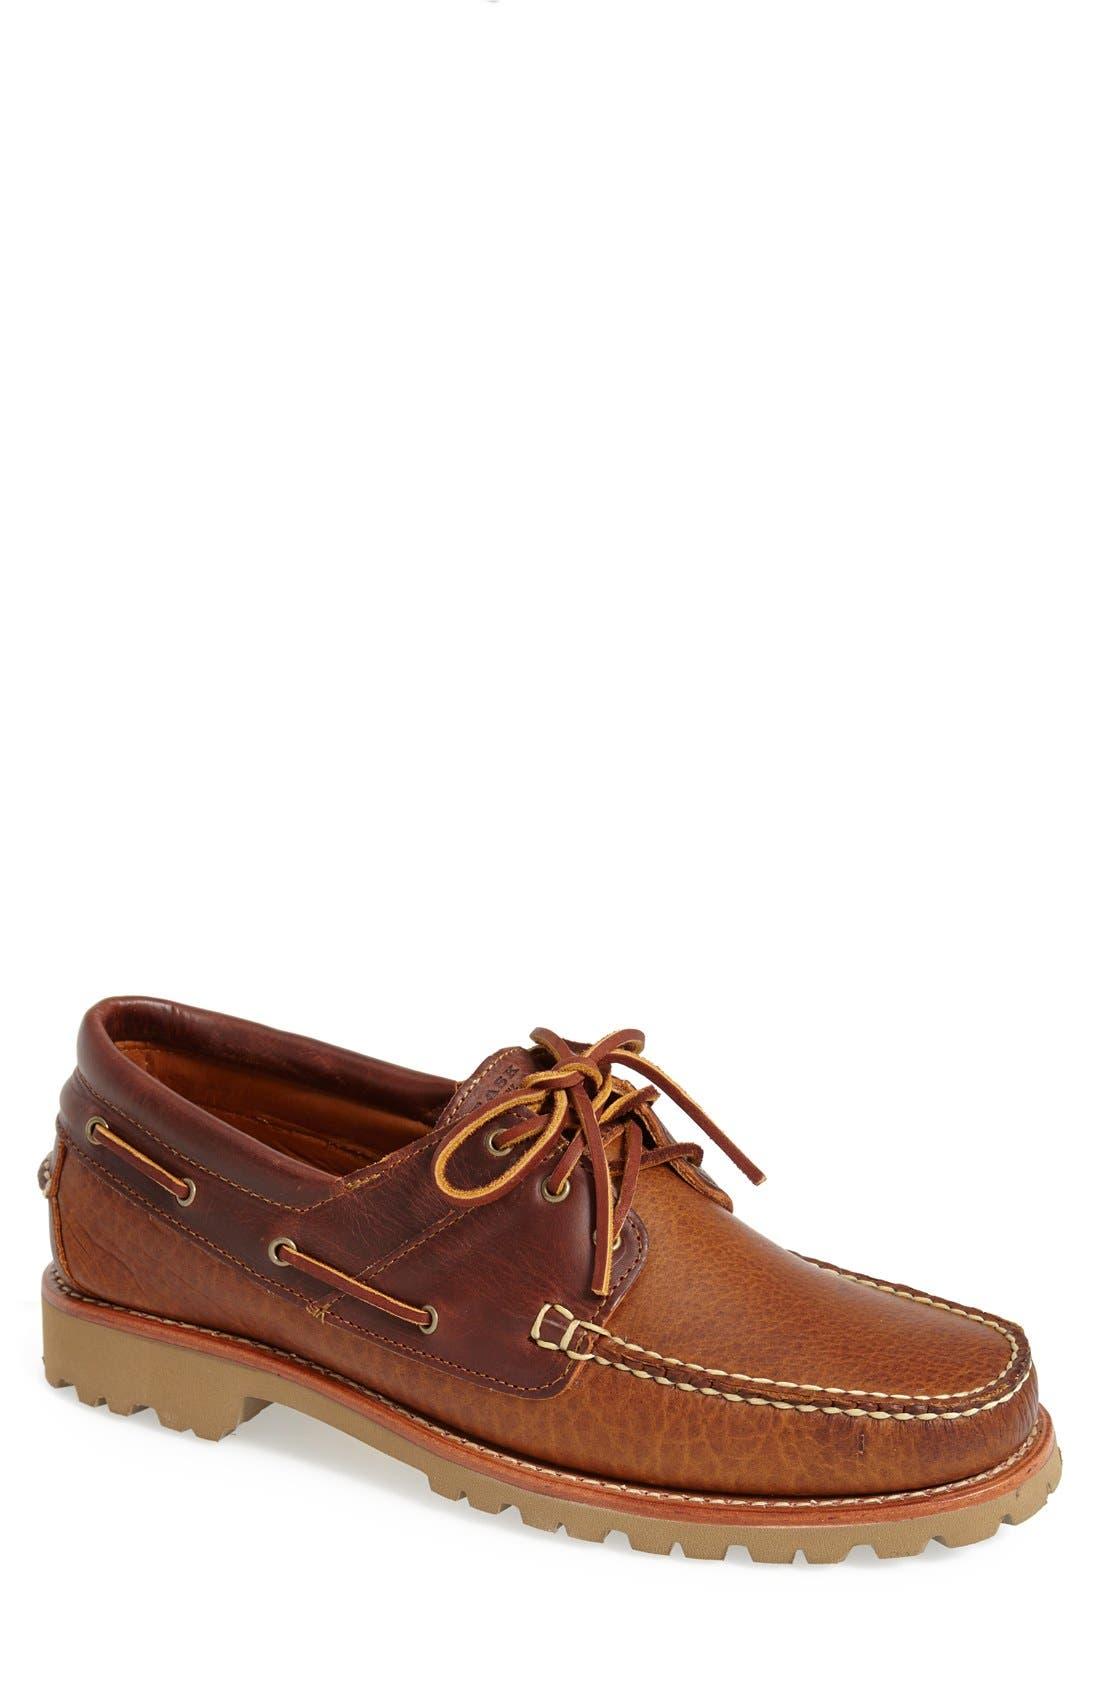 'Custer' Boat Shoe,                             Main thumbnail 1, color,                             Whiskey